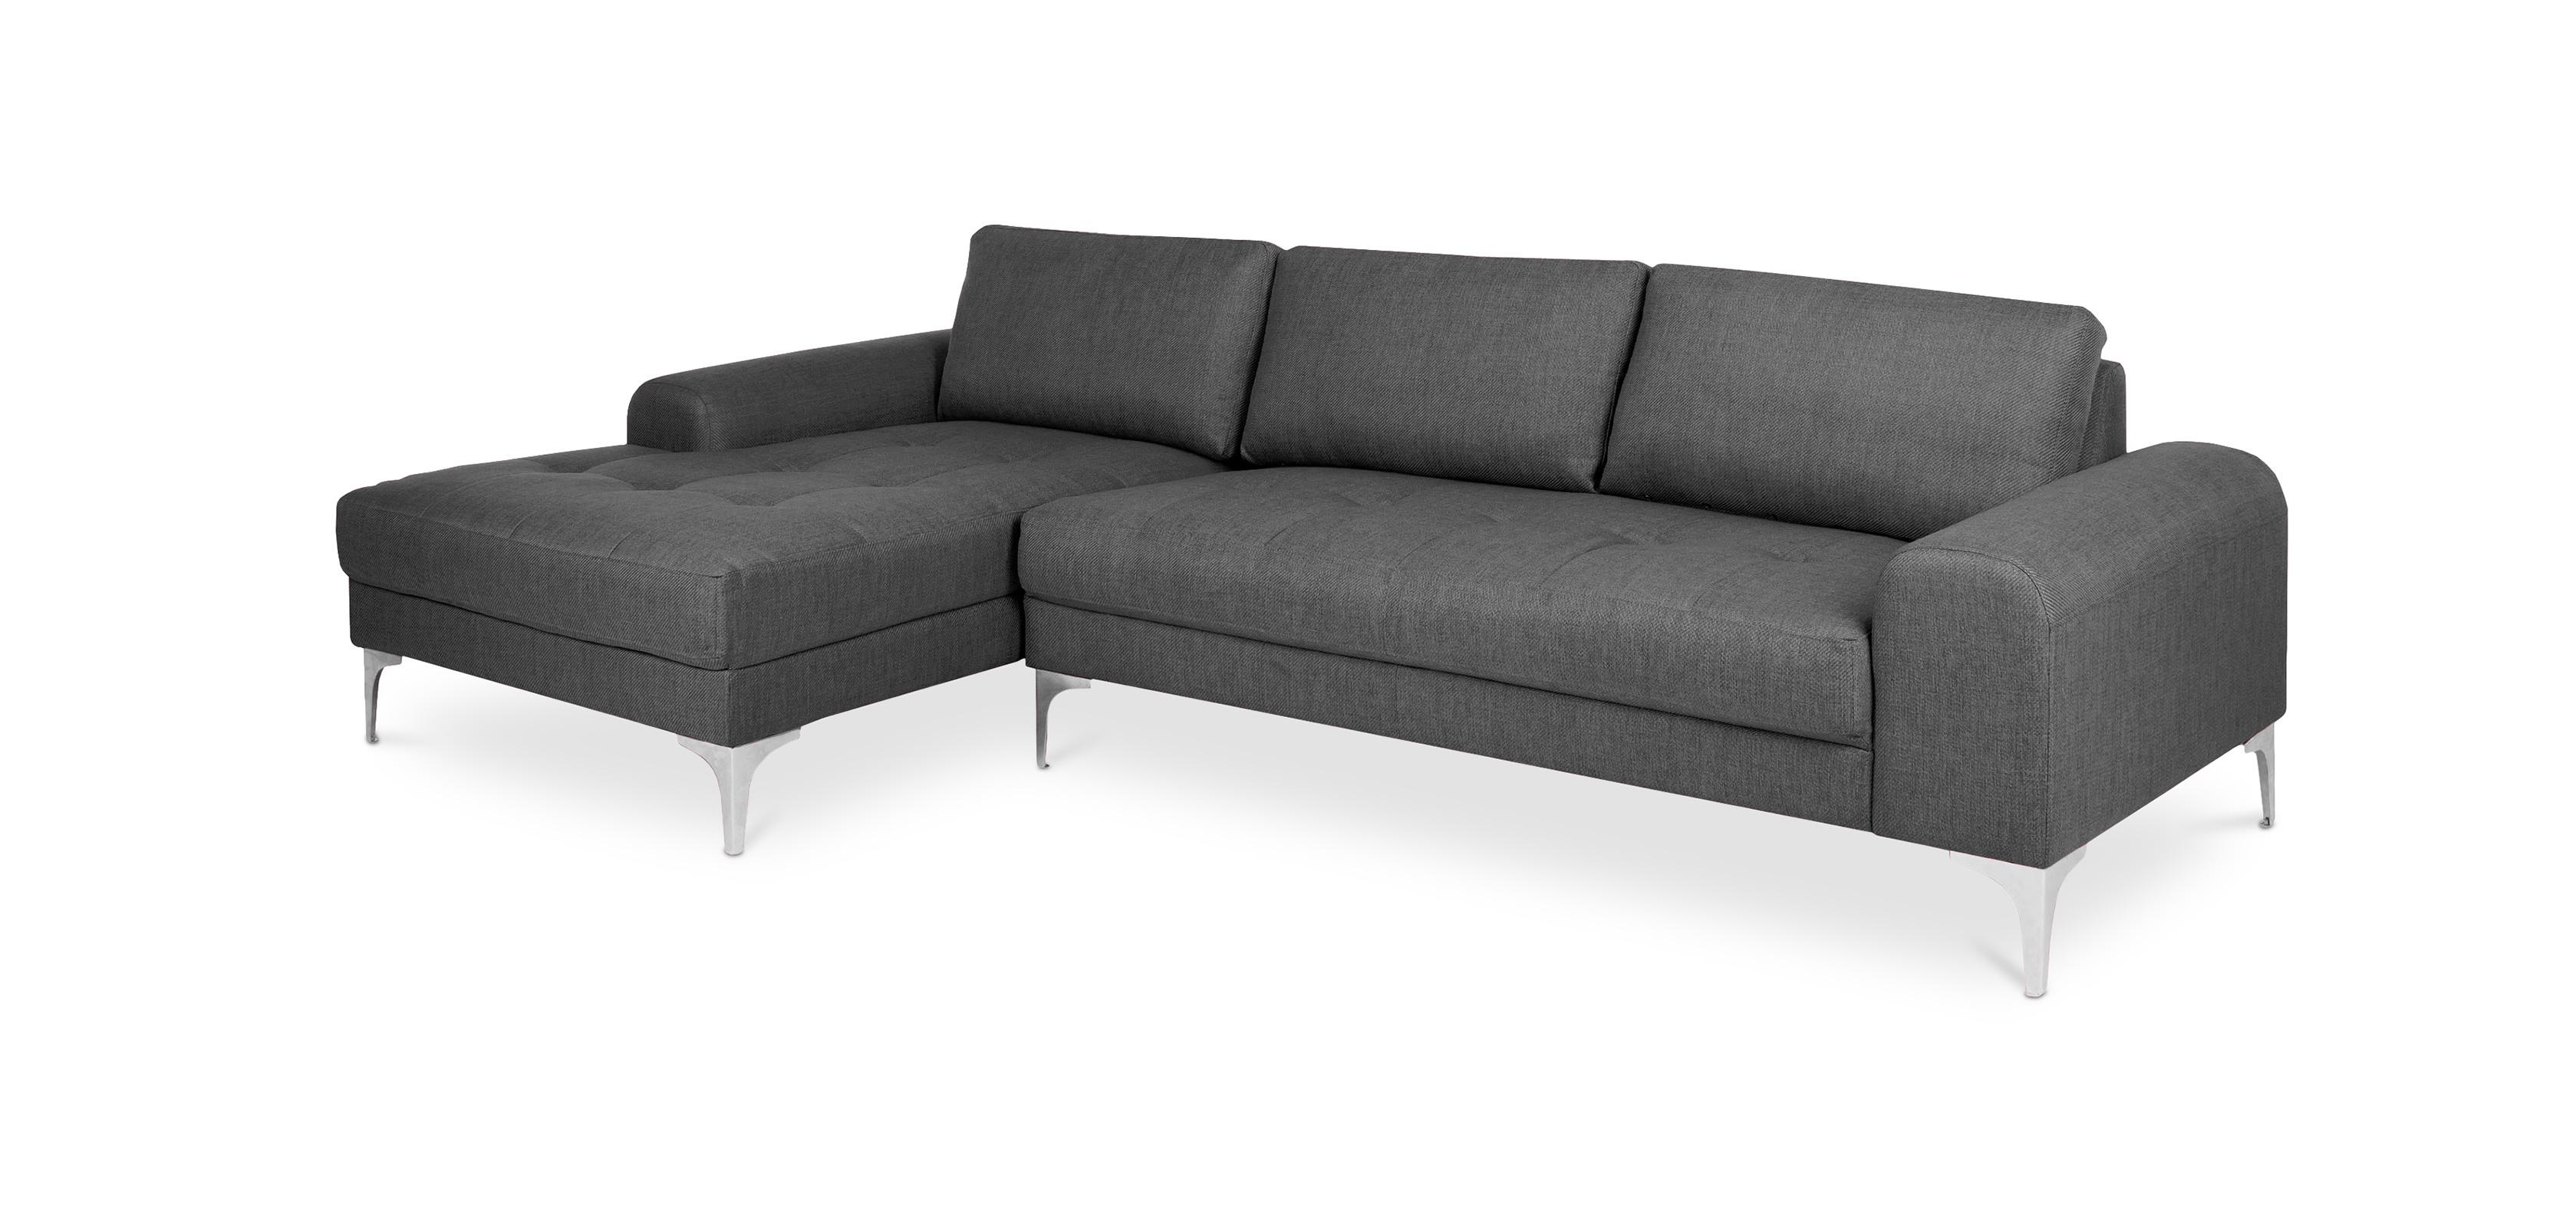 Living room Corner Sofa 5 seats Fabric